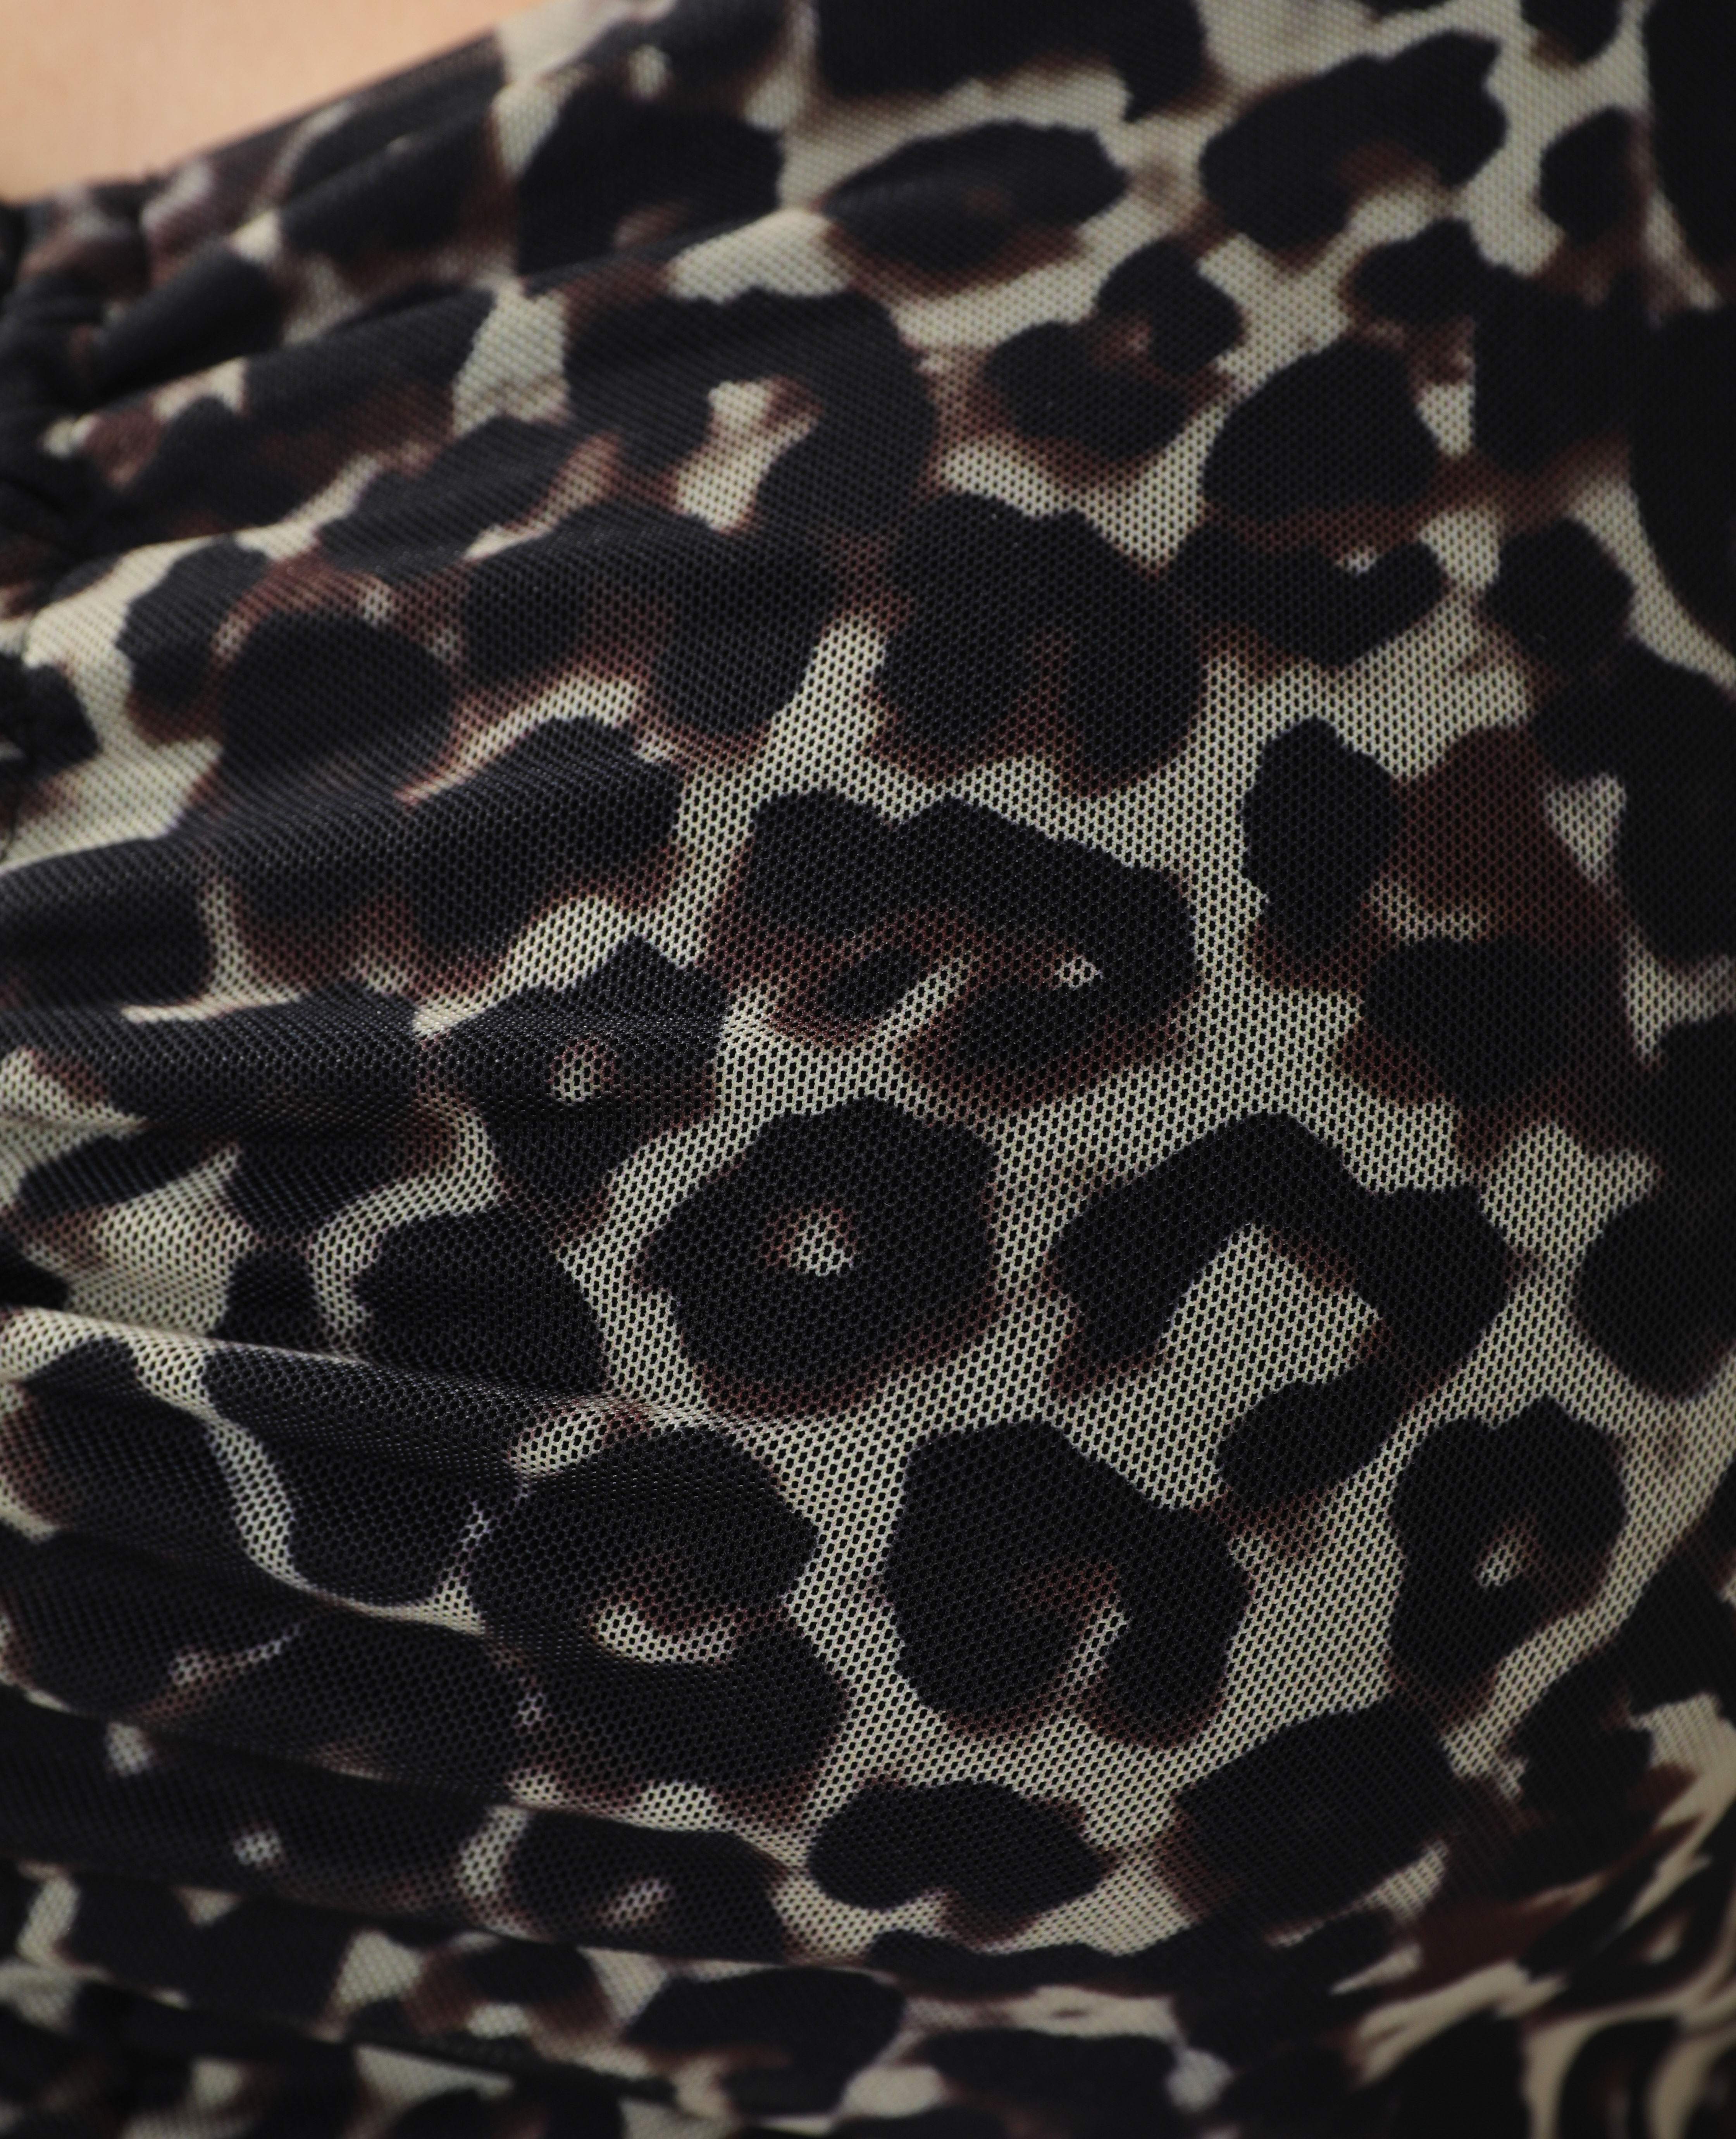 Top court léopard beige ficelle - Pimkie